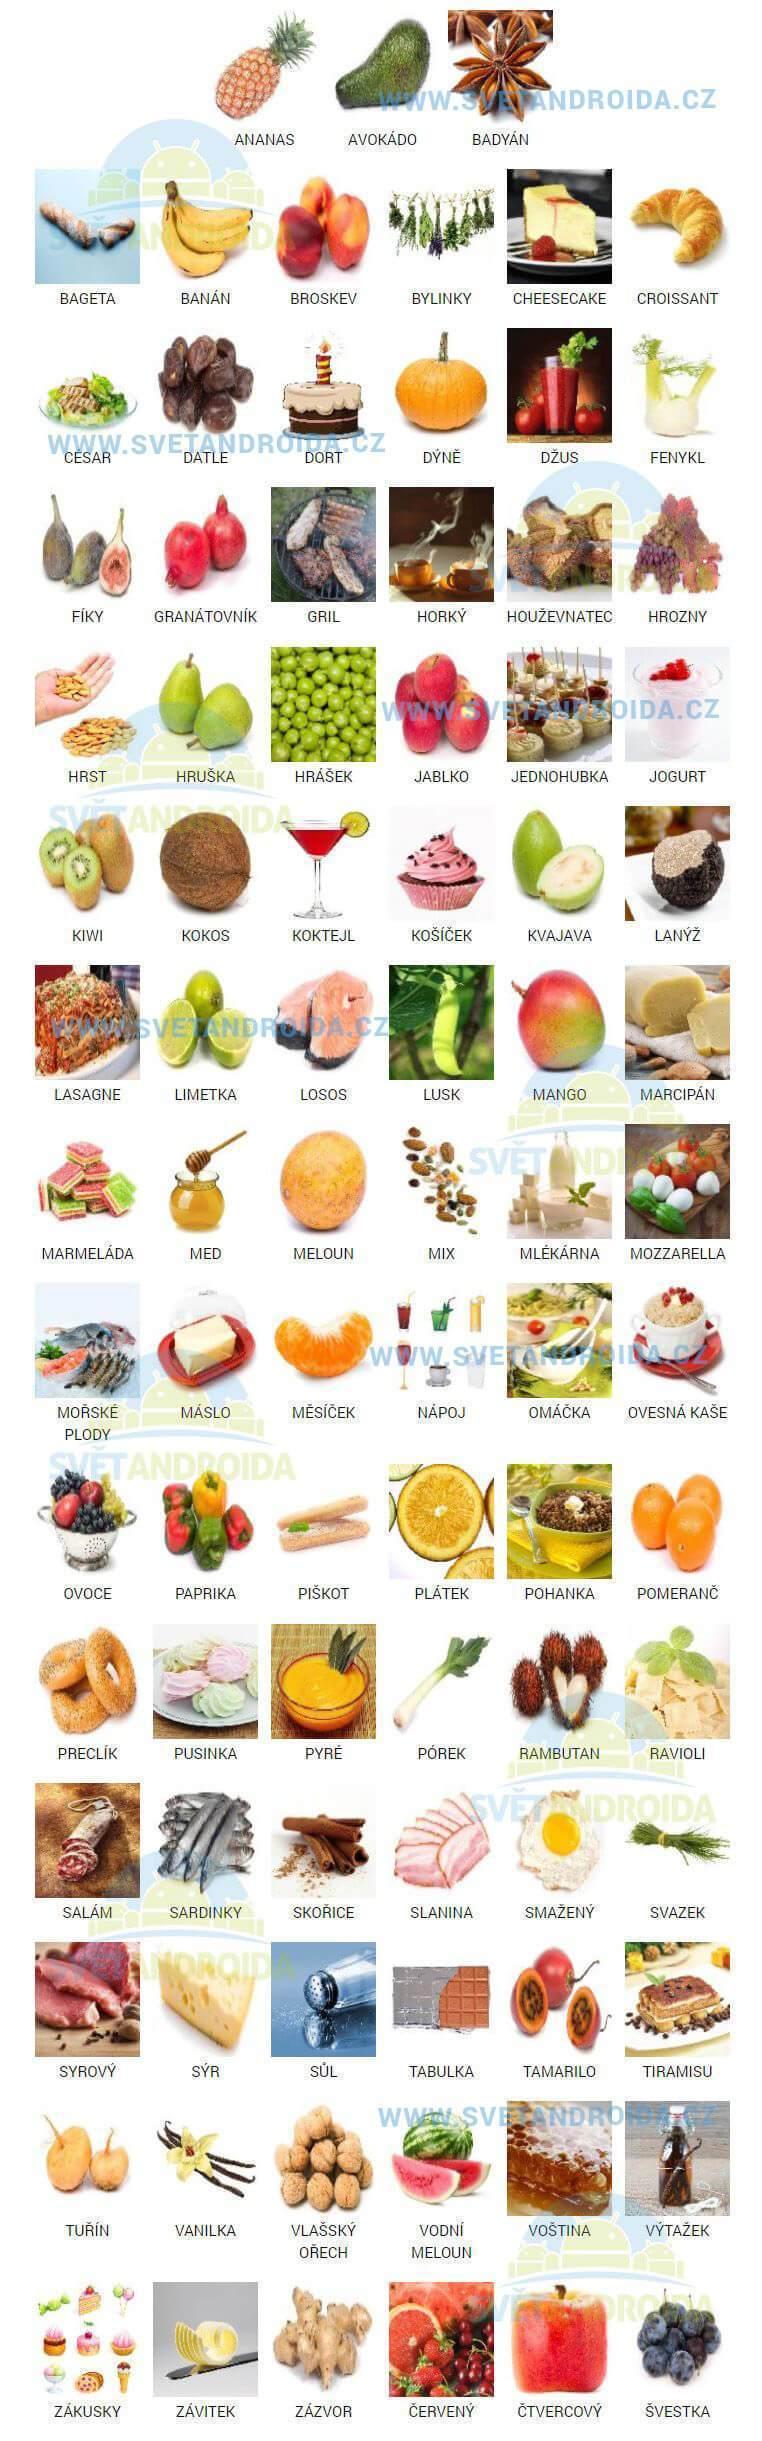 pixwords_answers_help_jidlo-potraviny